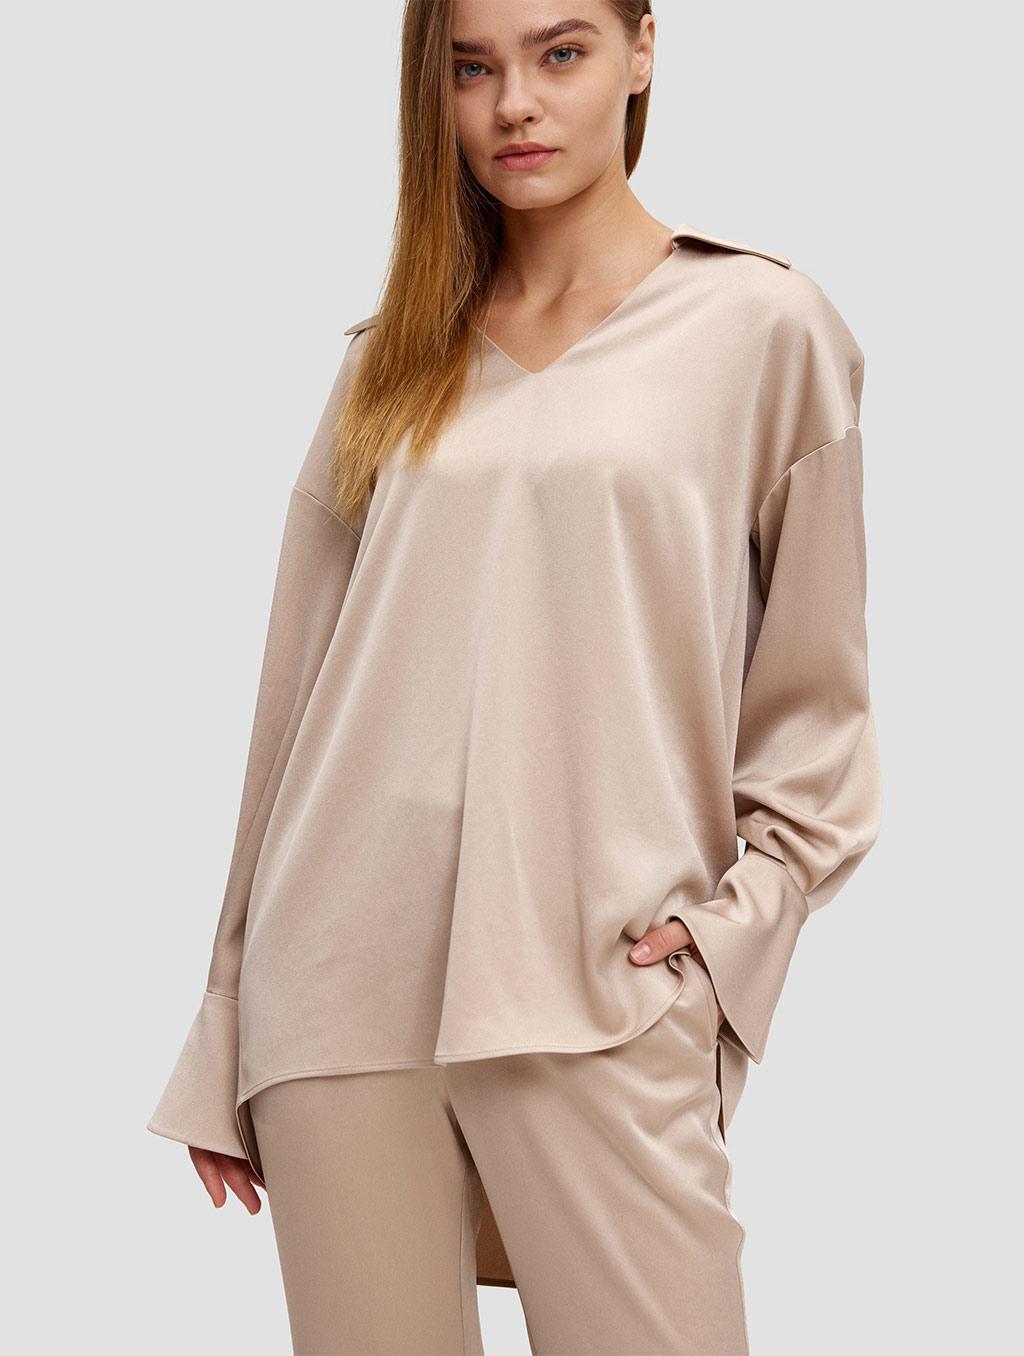 Buttoned Cuff Blouse - positive- light camel